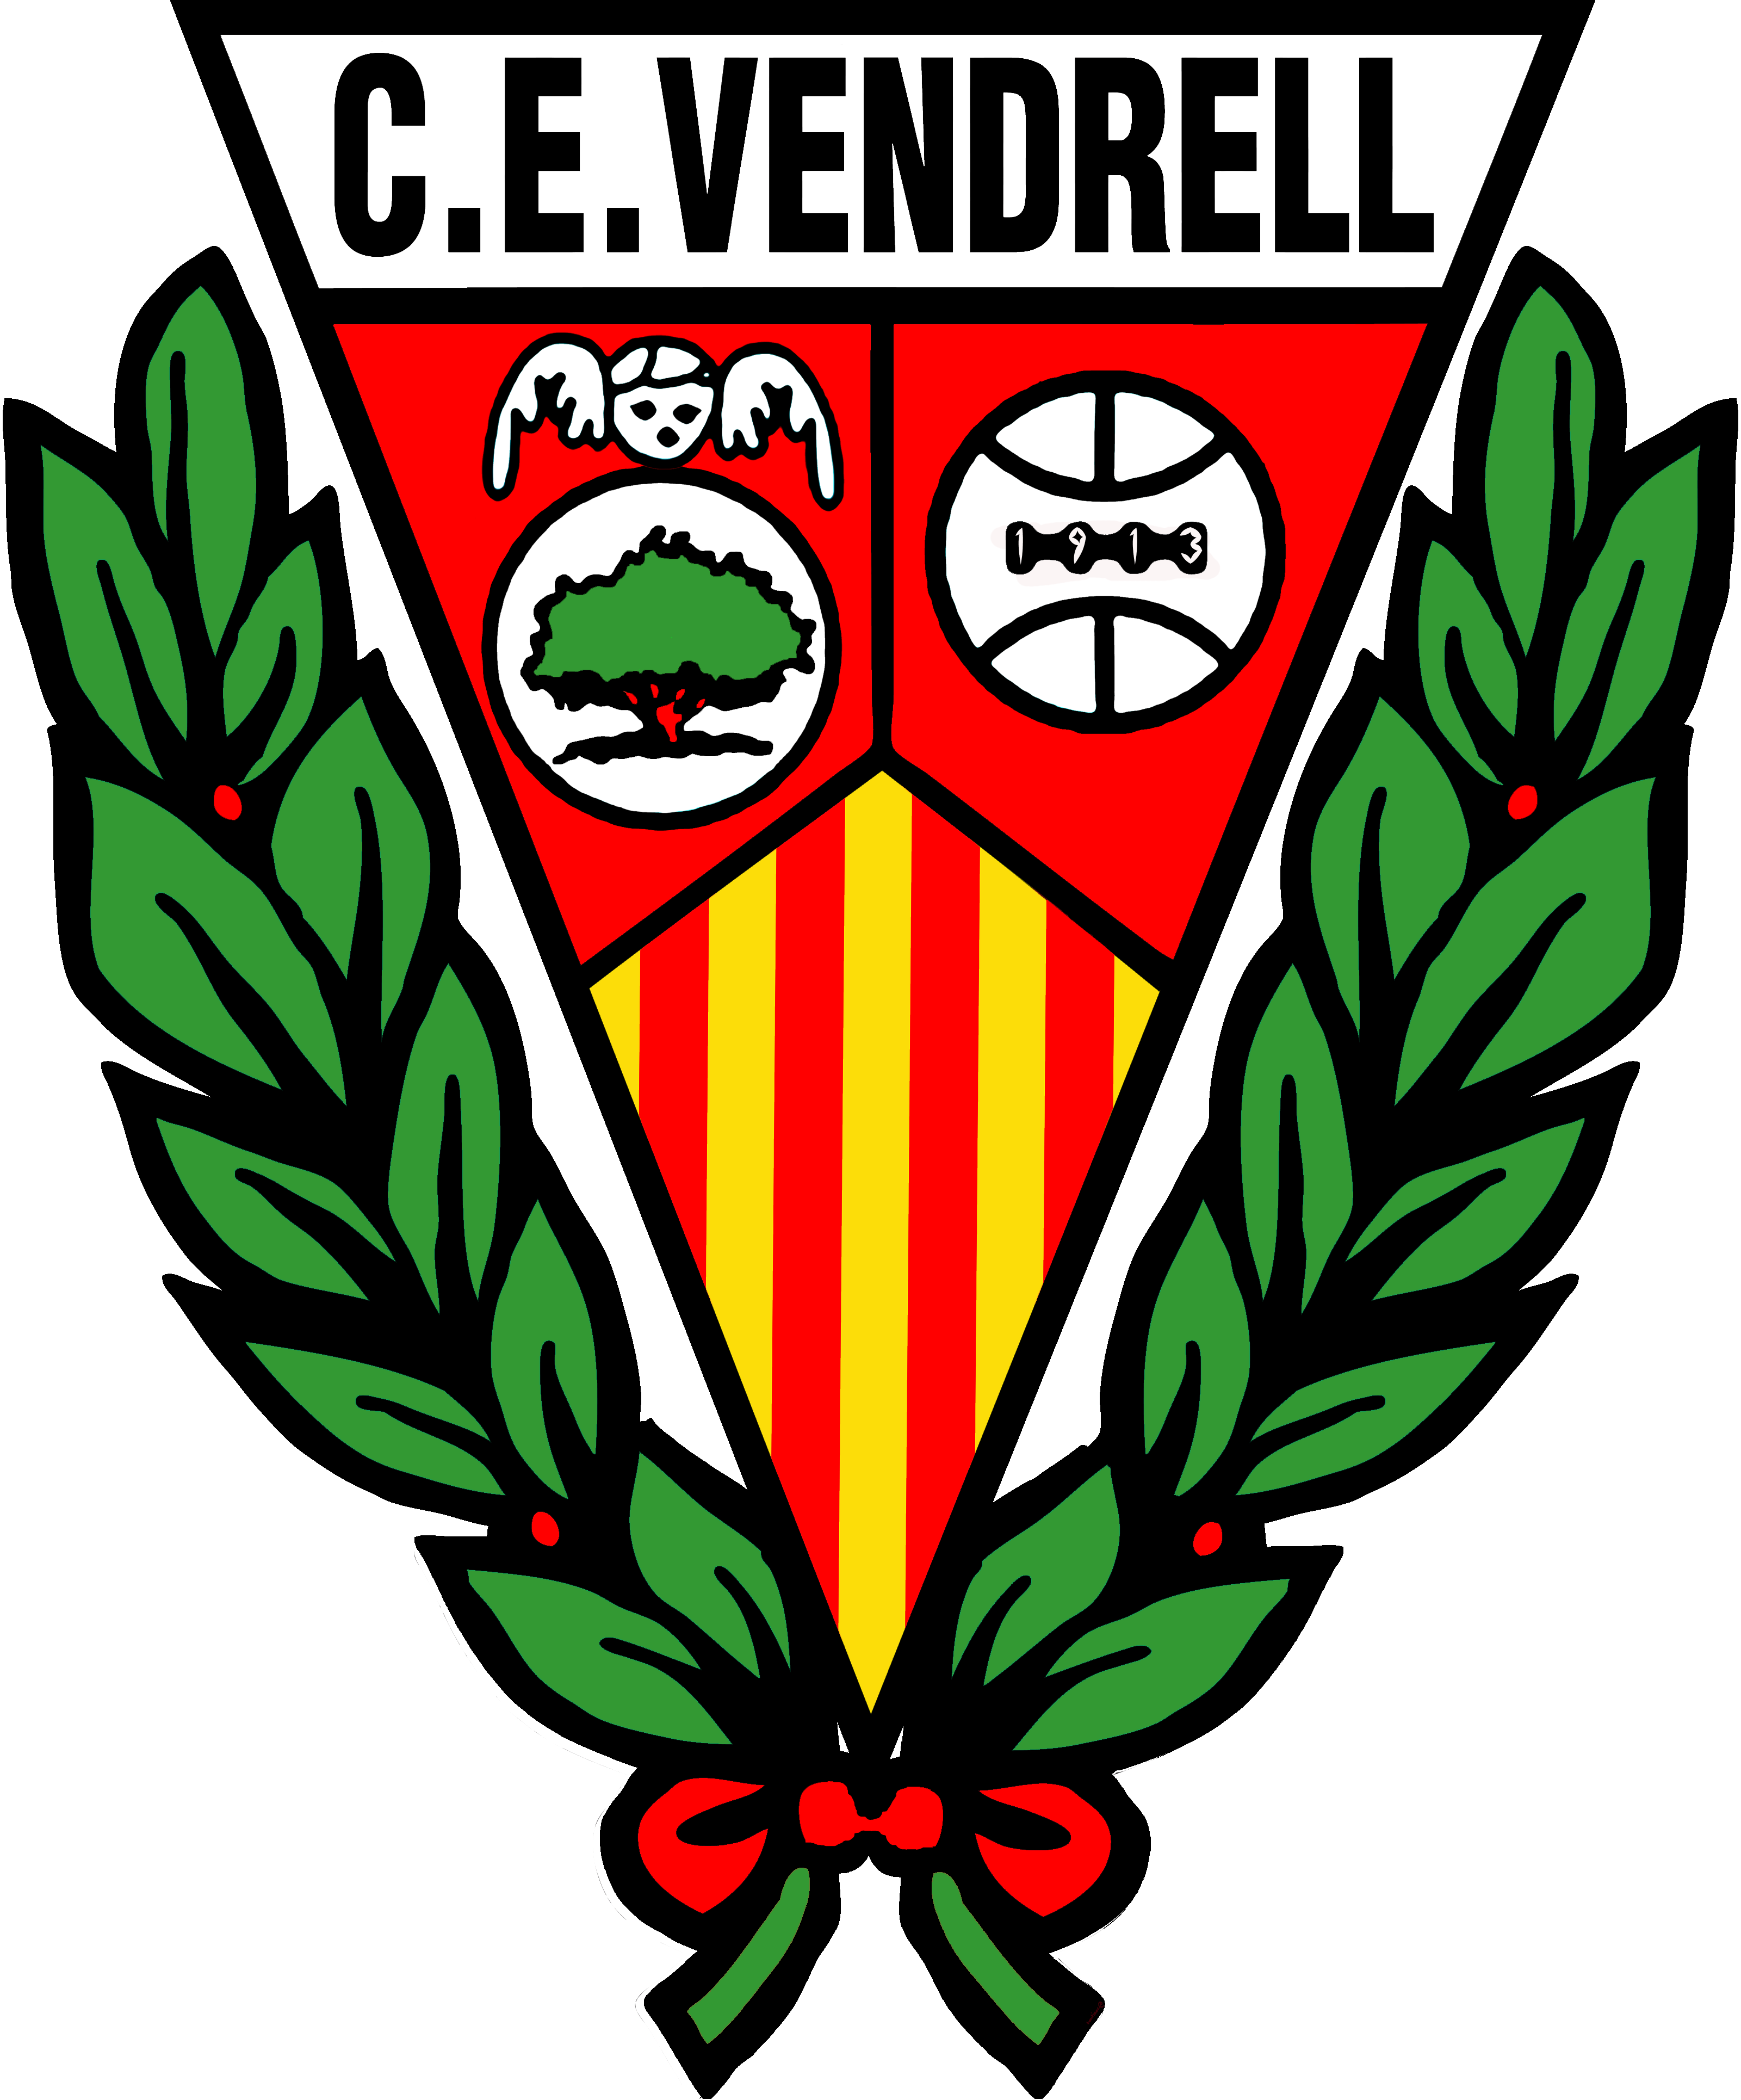 C.E. Vendrell Infantil B